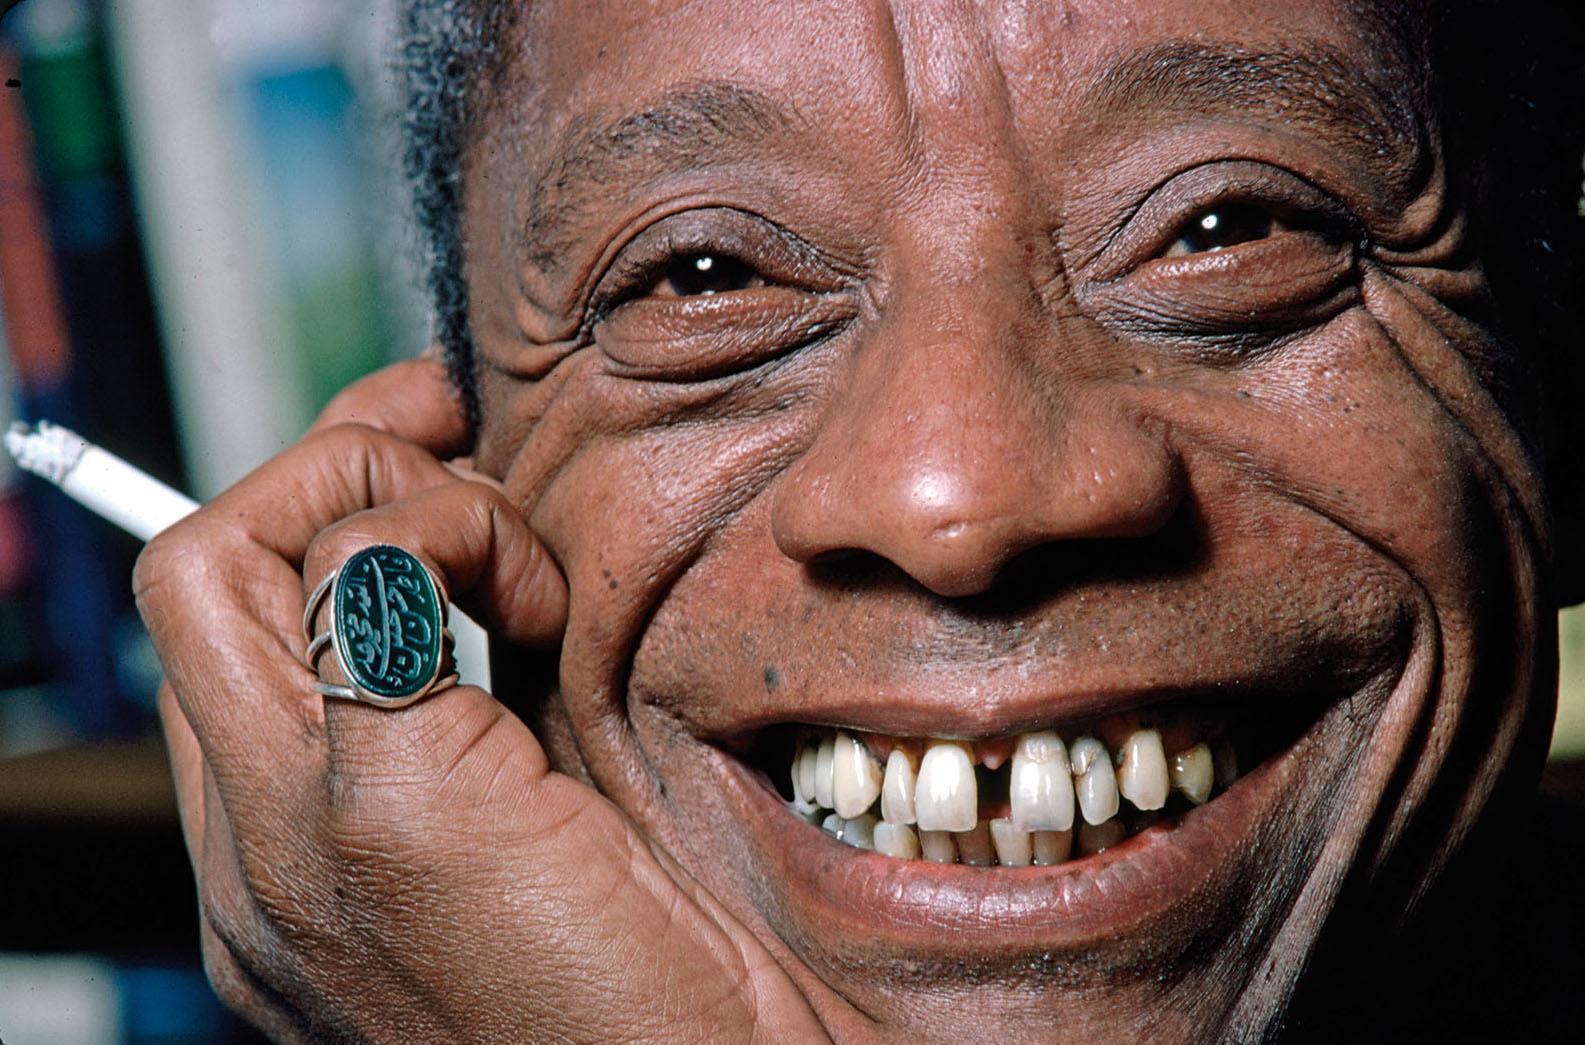 PÚBLICO - James Baldwin, pregador de uma América que ainda está por converter